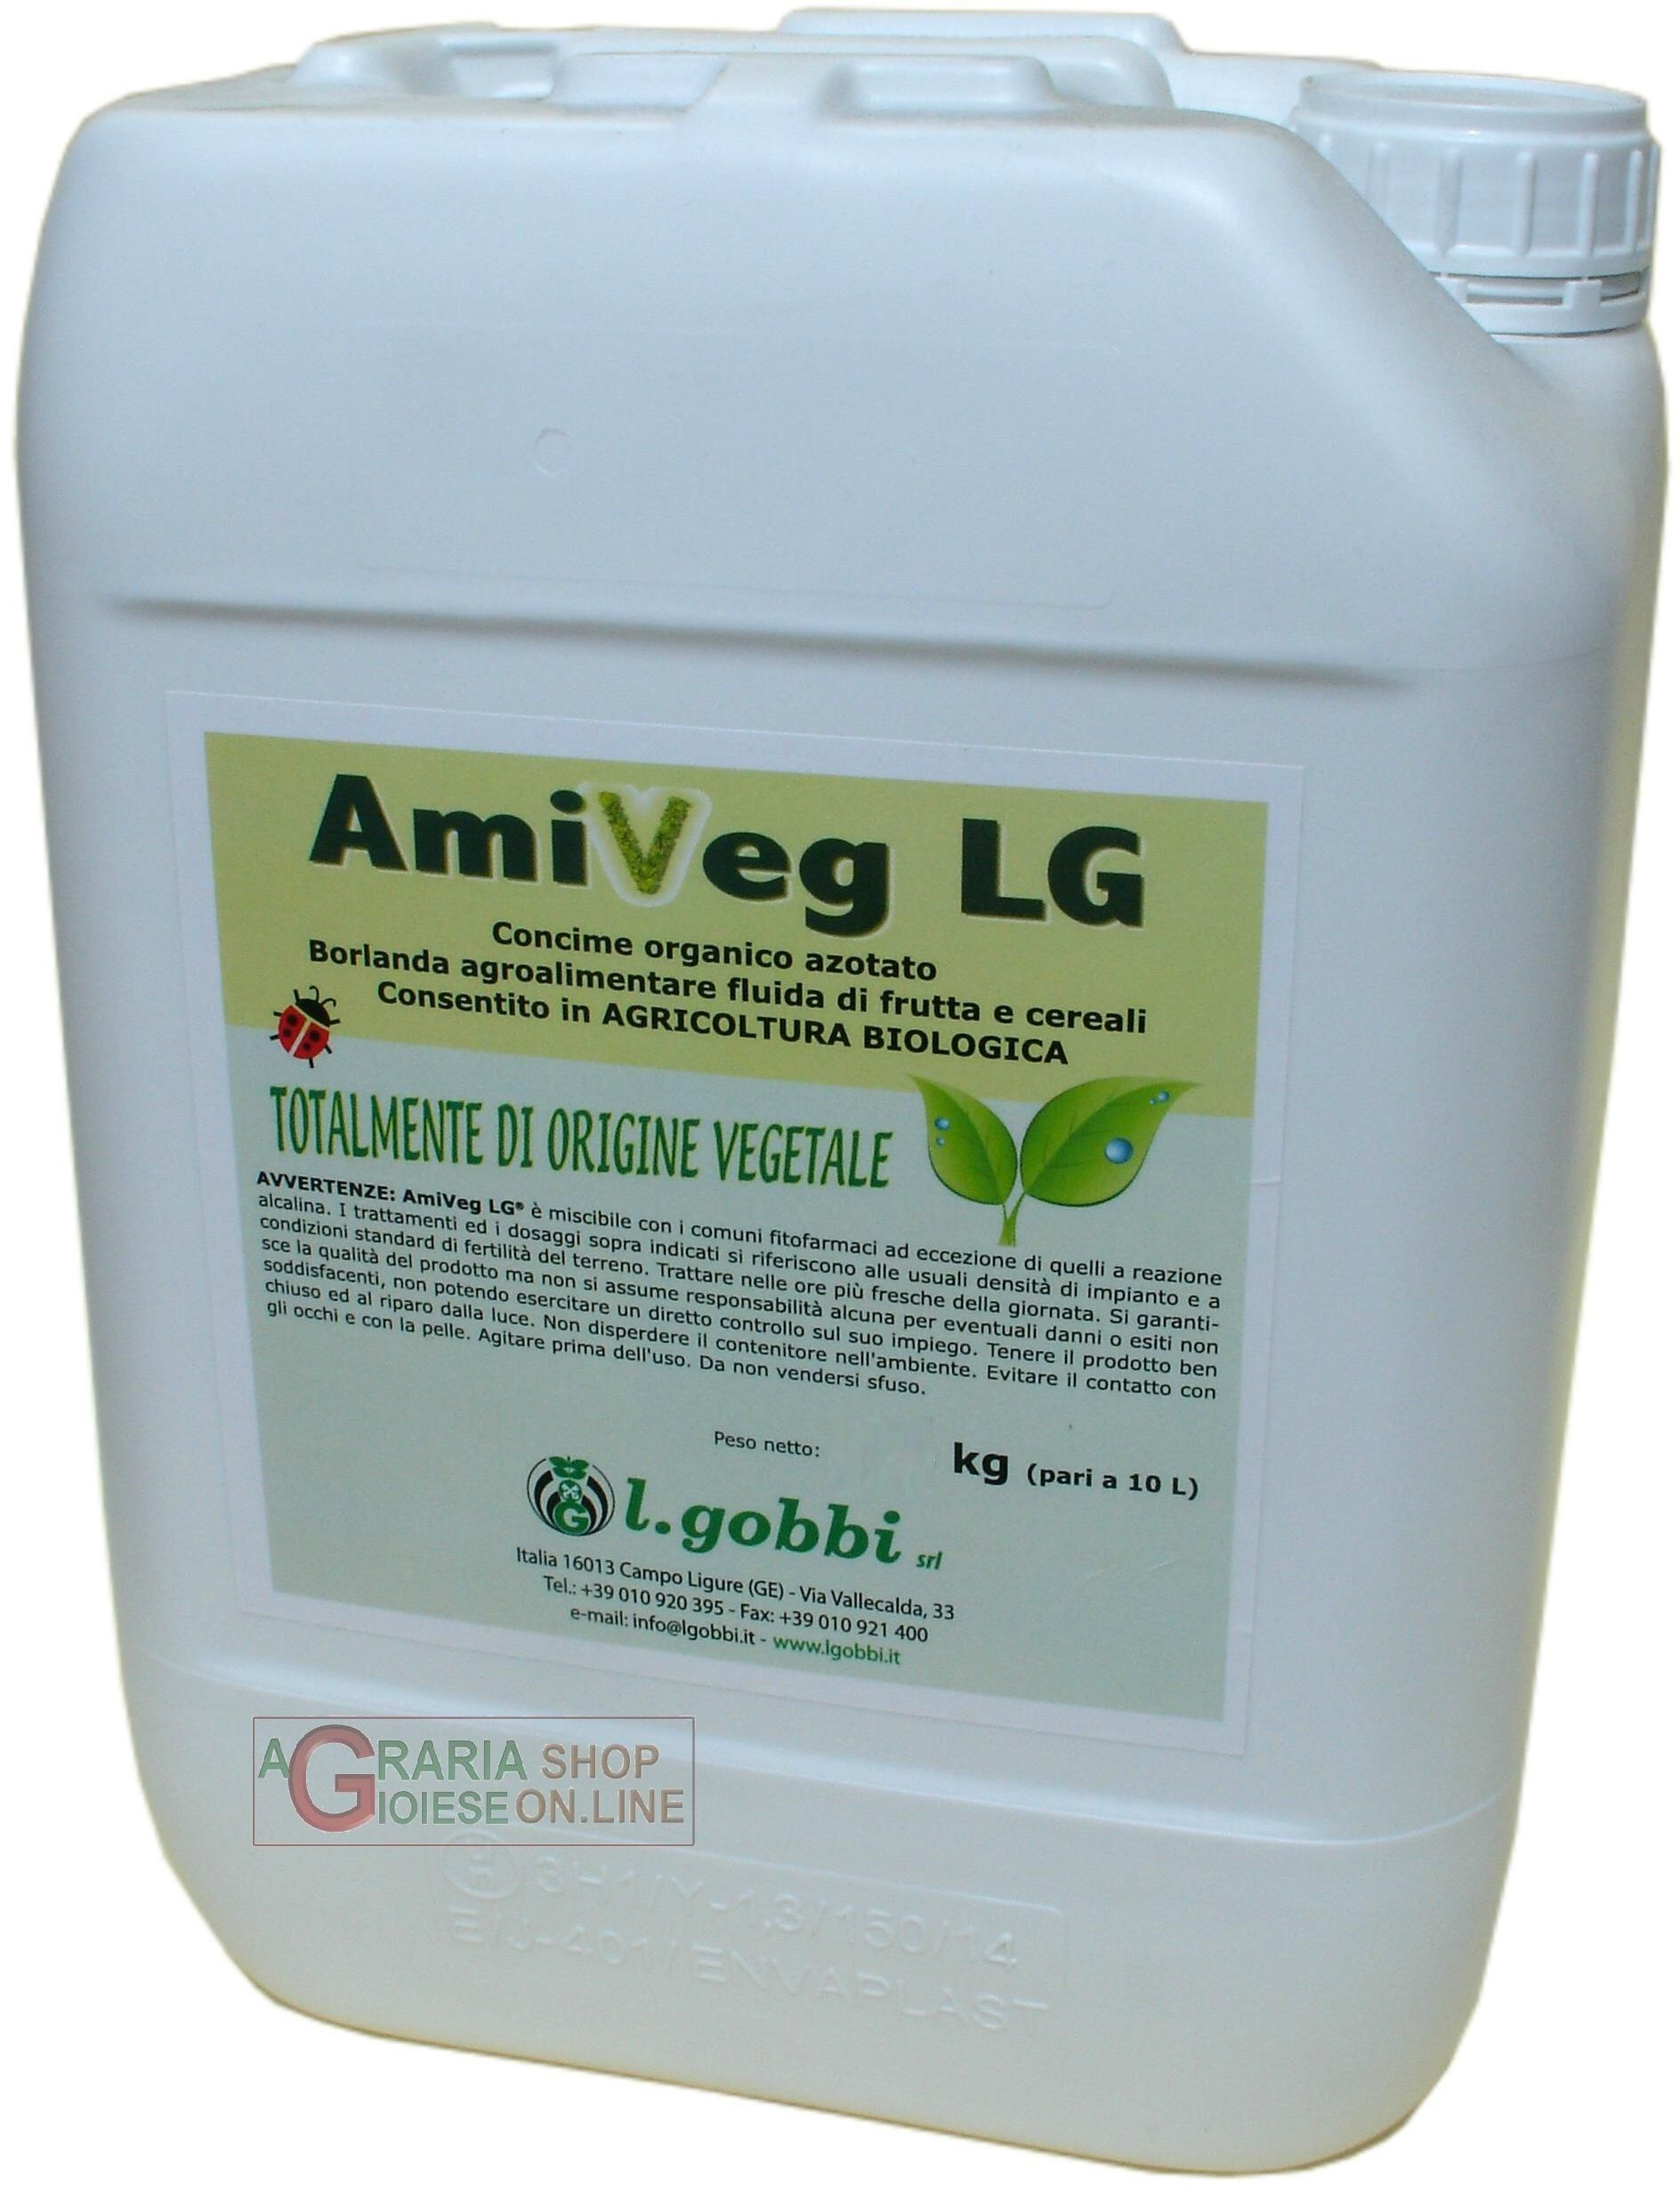 GOBBI AMIVEG LG CONCIME LIQUIDO ORGANO AZOTATO DI ORIGINE VEGETALE KG. 25 http://www.decariashop.it/concimi-per-fertirrigazione/7095-gobbi-amiveg-lg-concime-liquido-organo-azotato-di-origine-vegetale-kg-25.html